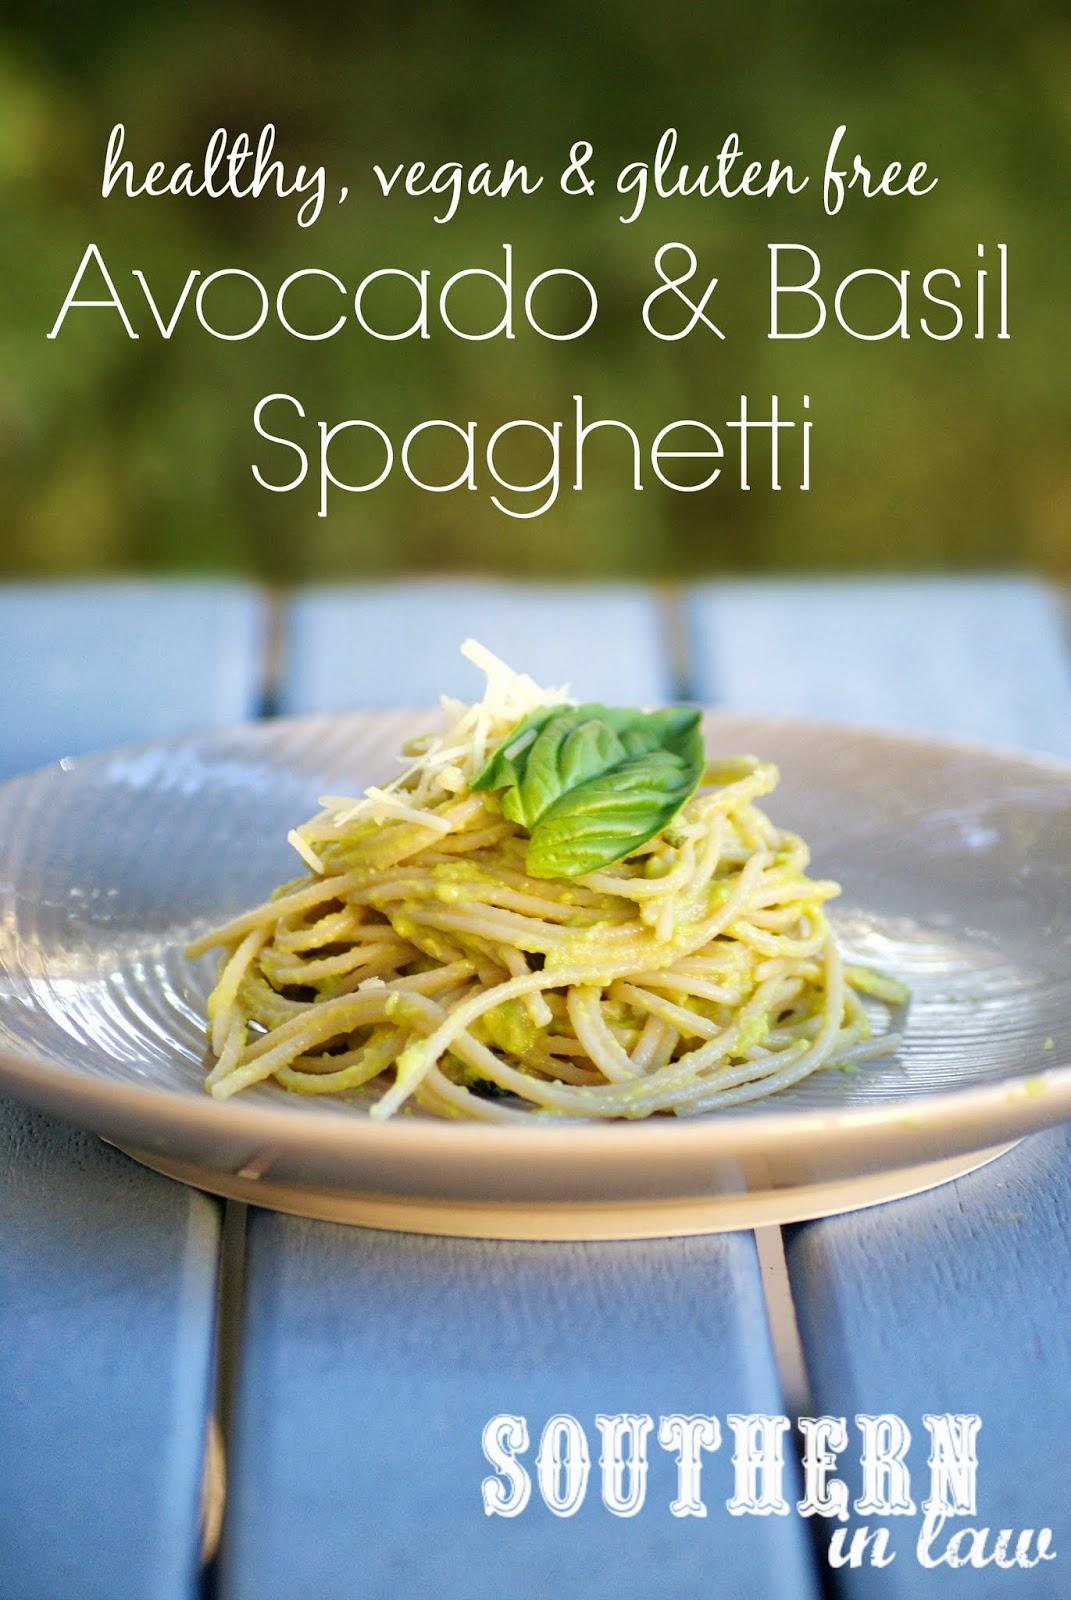 Healthy Avocado and Basil Spaghetti Recipe - low fat, gluten free, sugar free, vegan, clean eating friendly